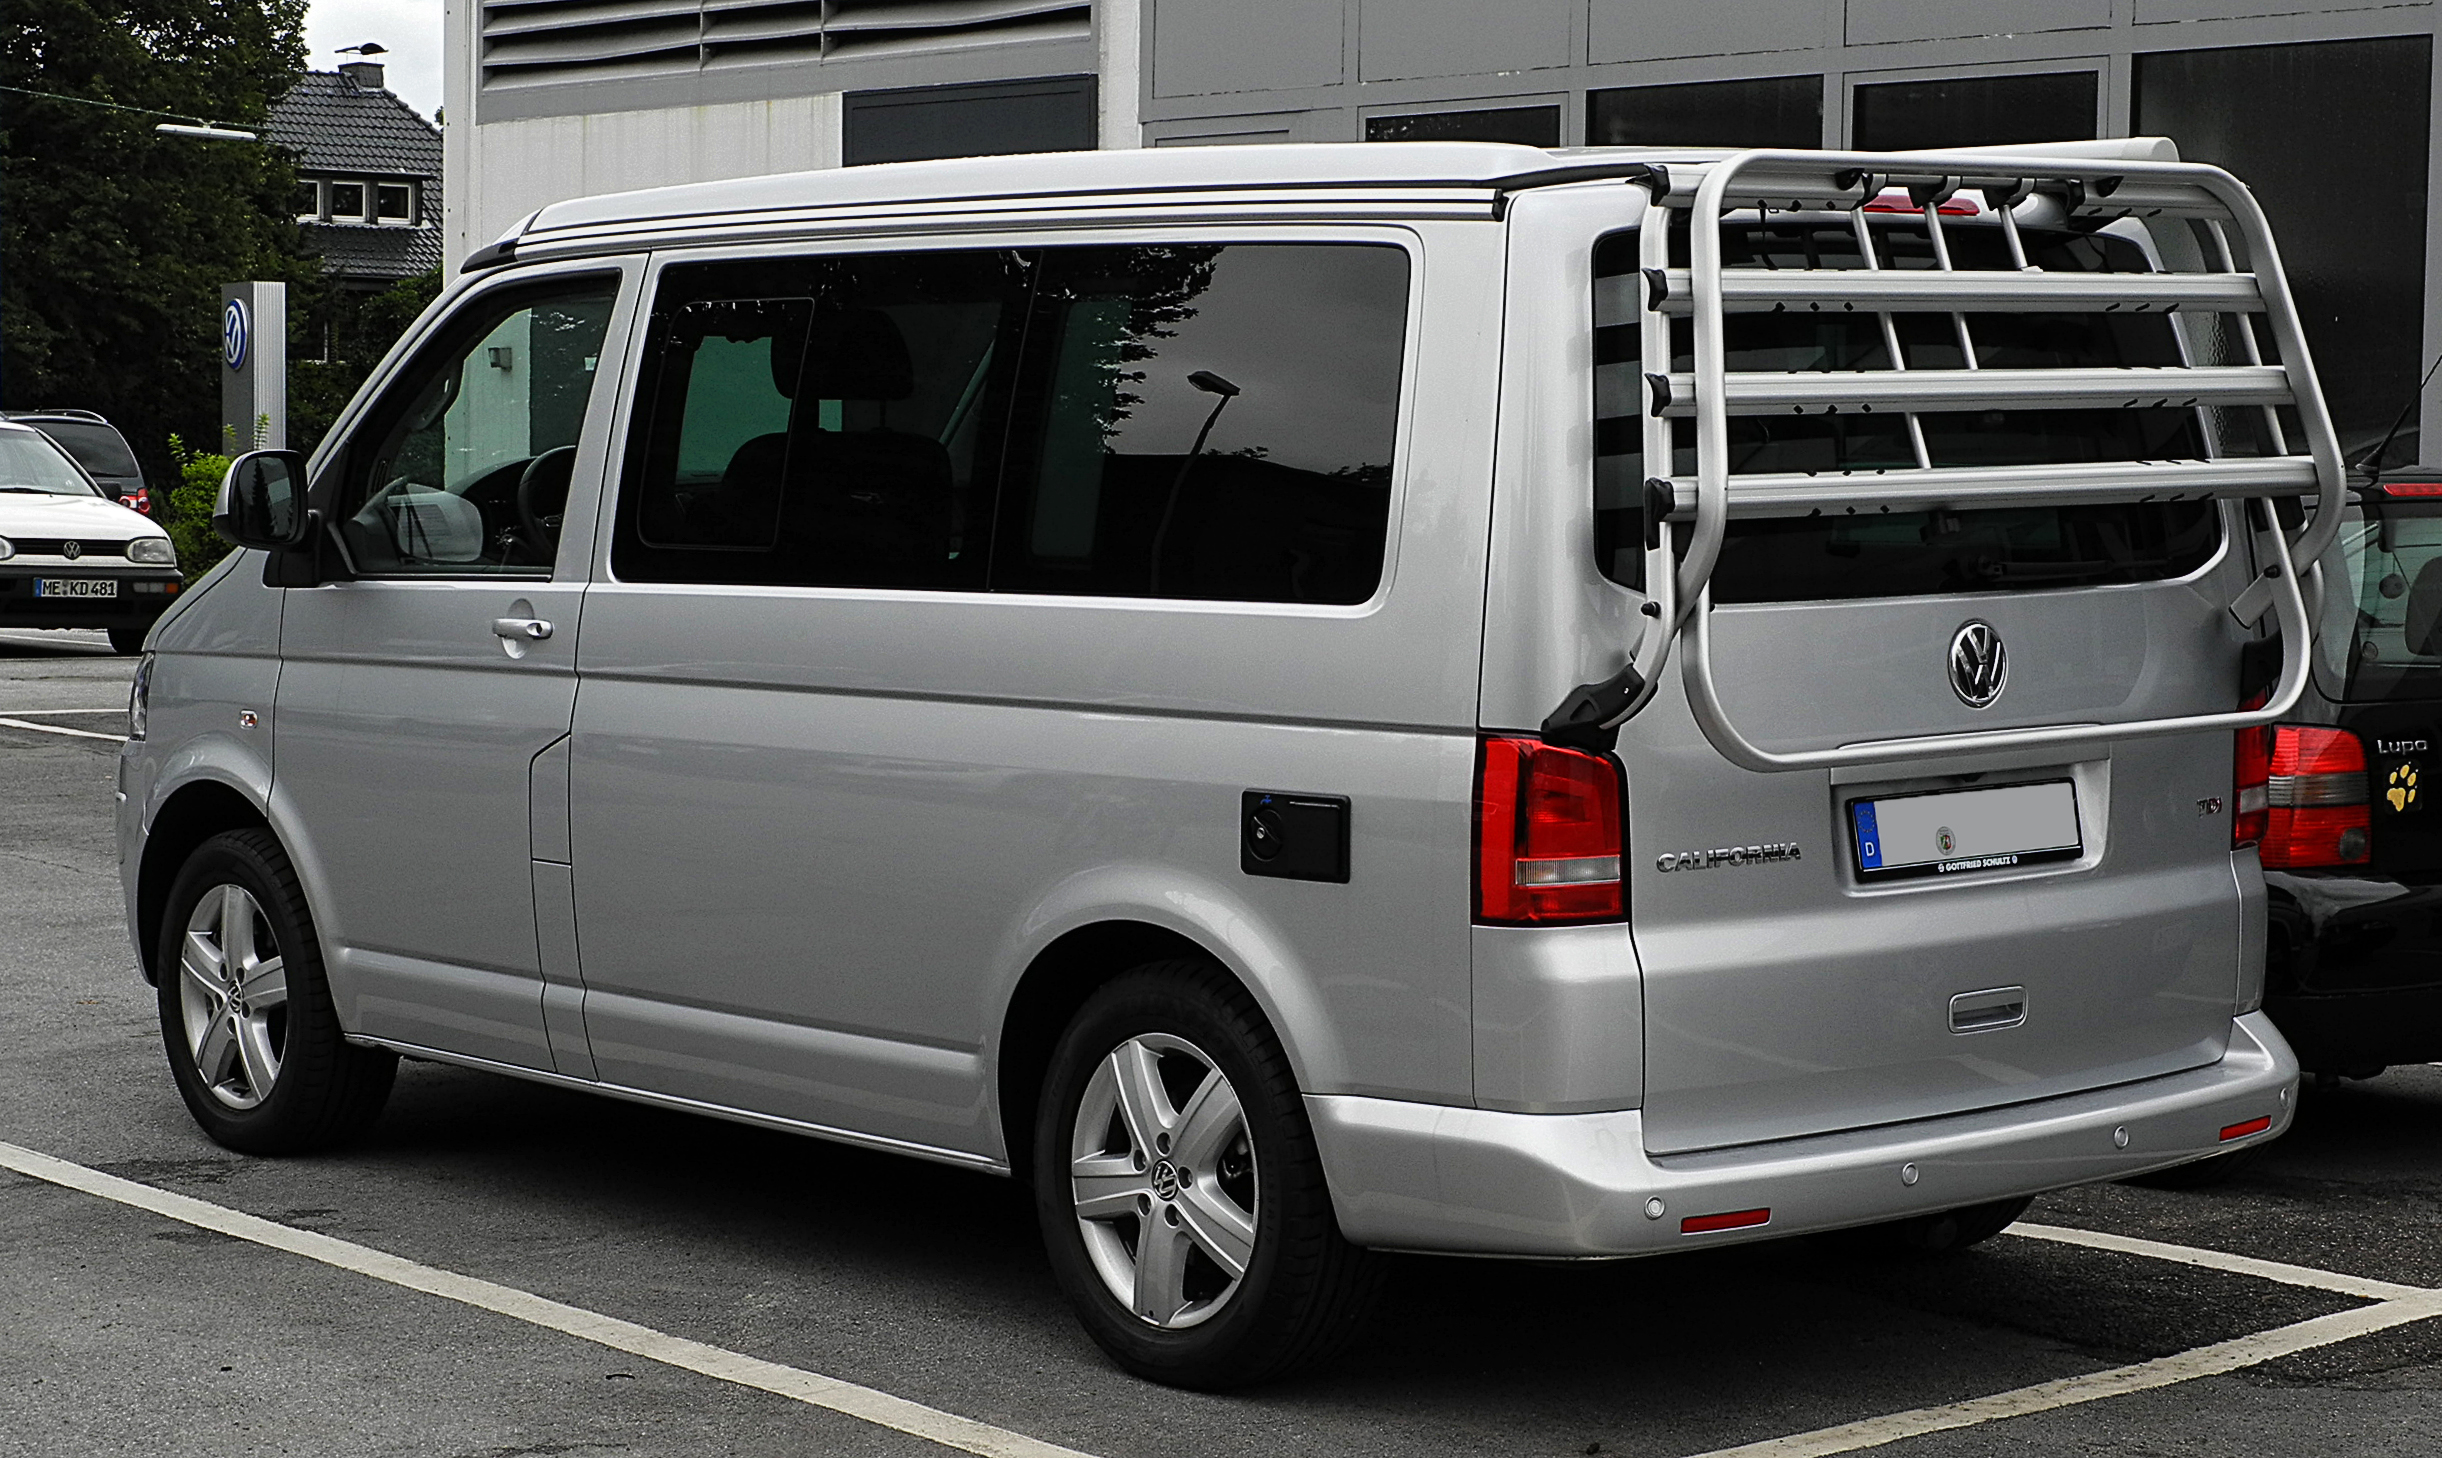 File:VW California Europe 2.0 TDI (T5, Facelift) – Heckansicht, 30